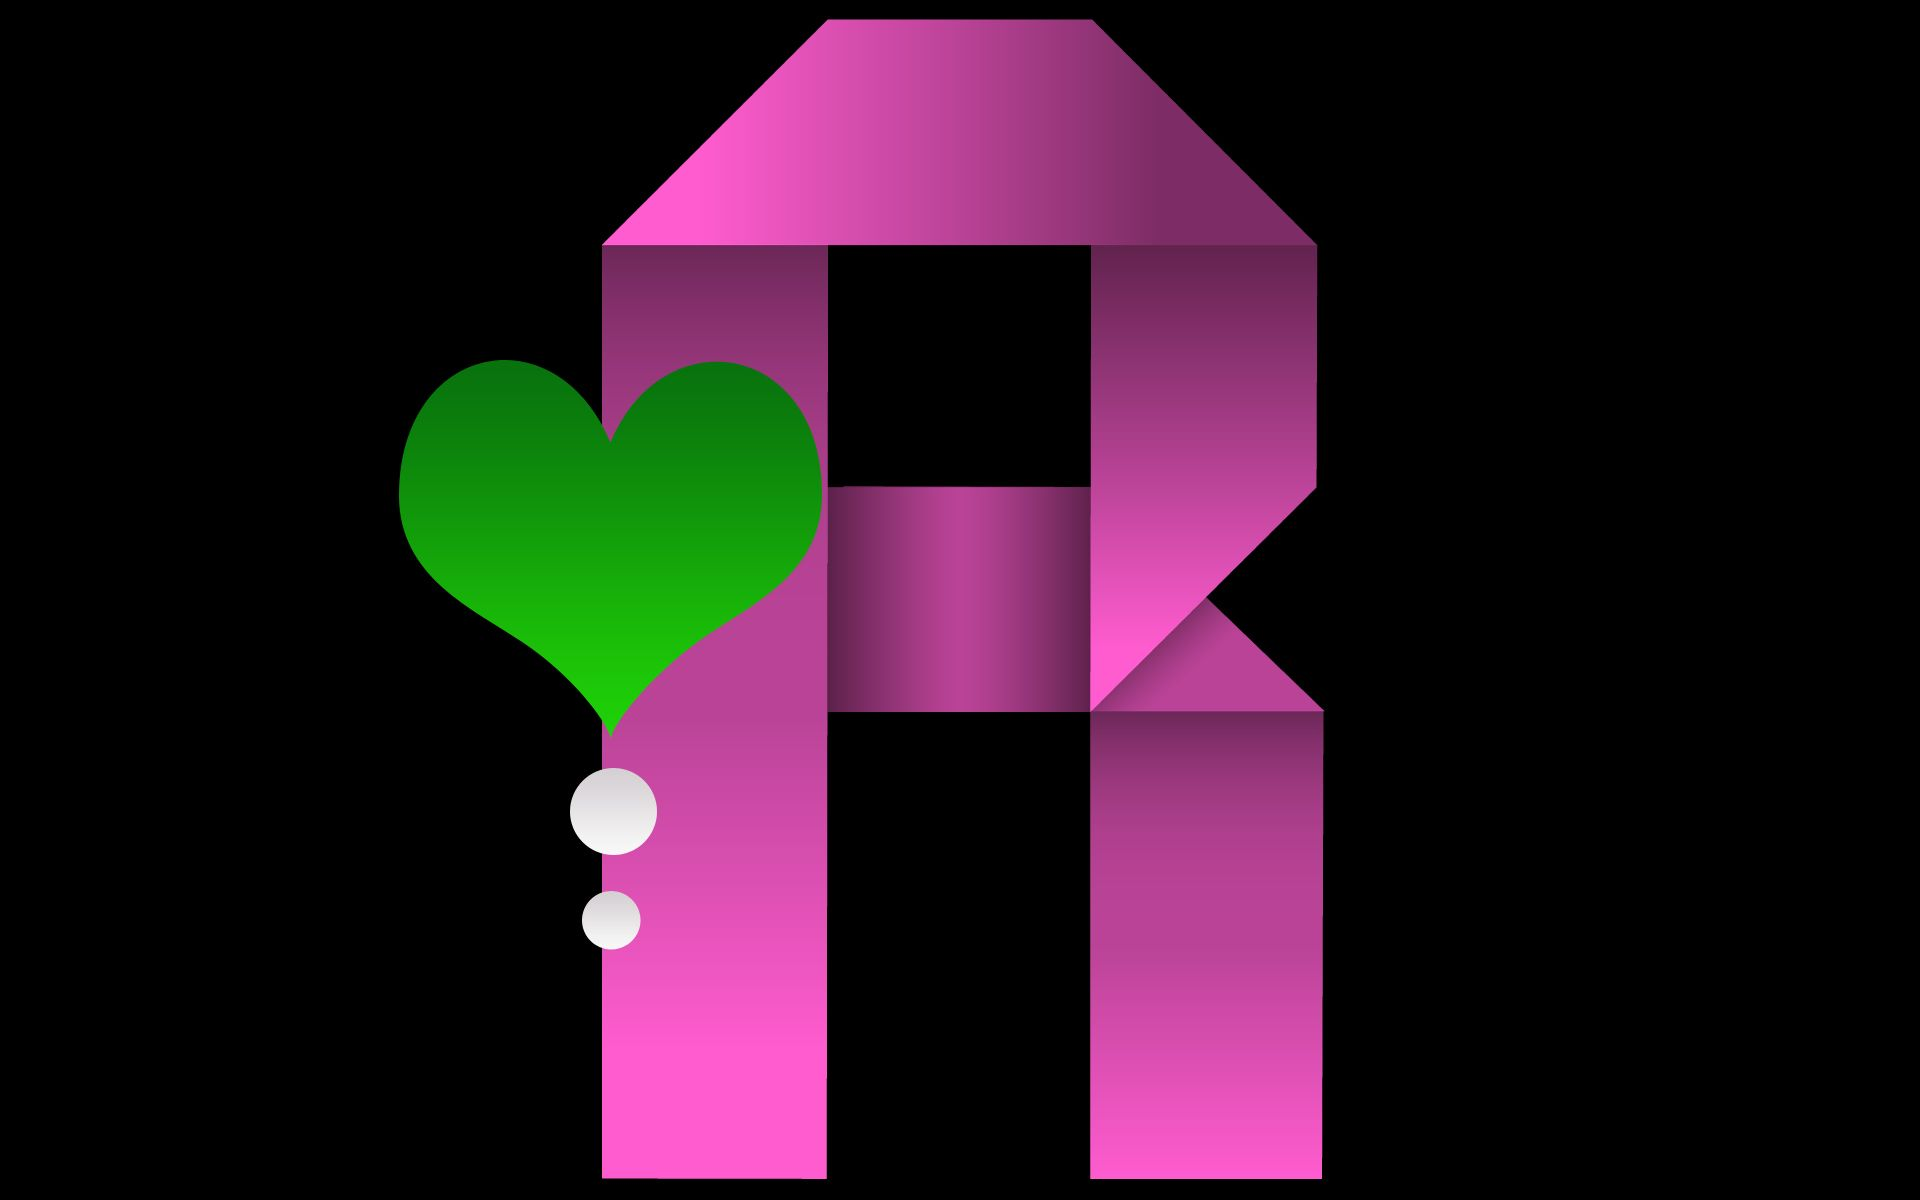 R Alphabet Wallpaper Alphabet R Wallpaper |...